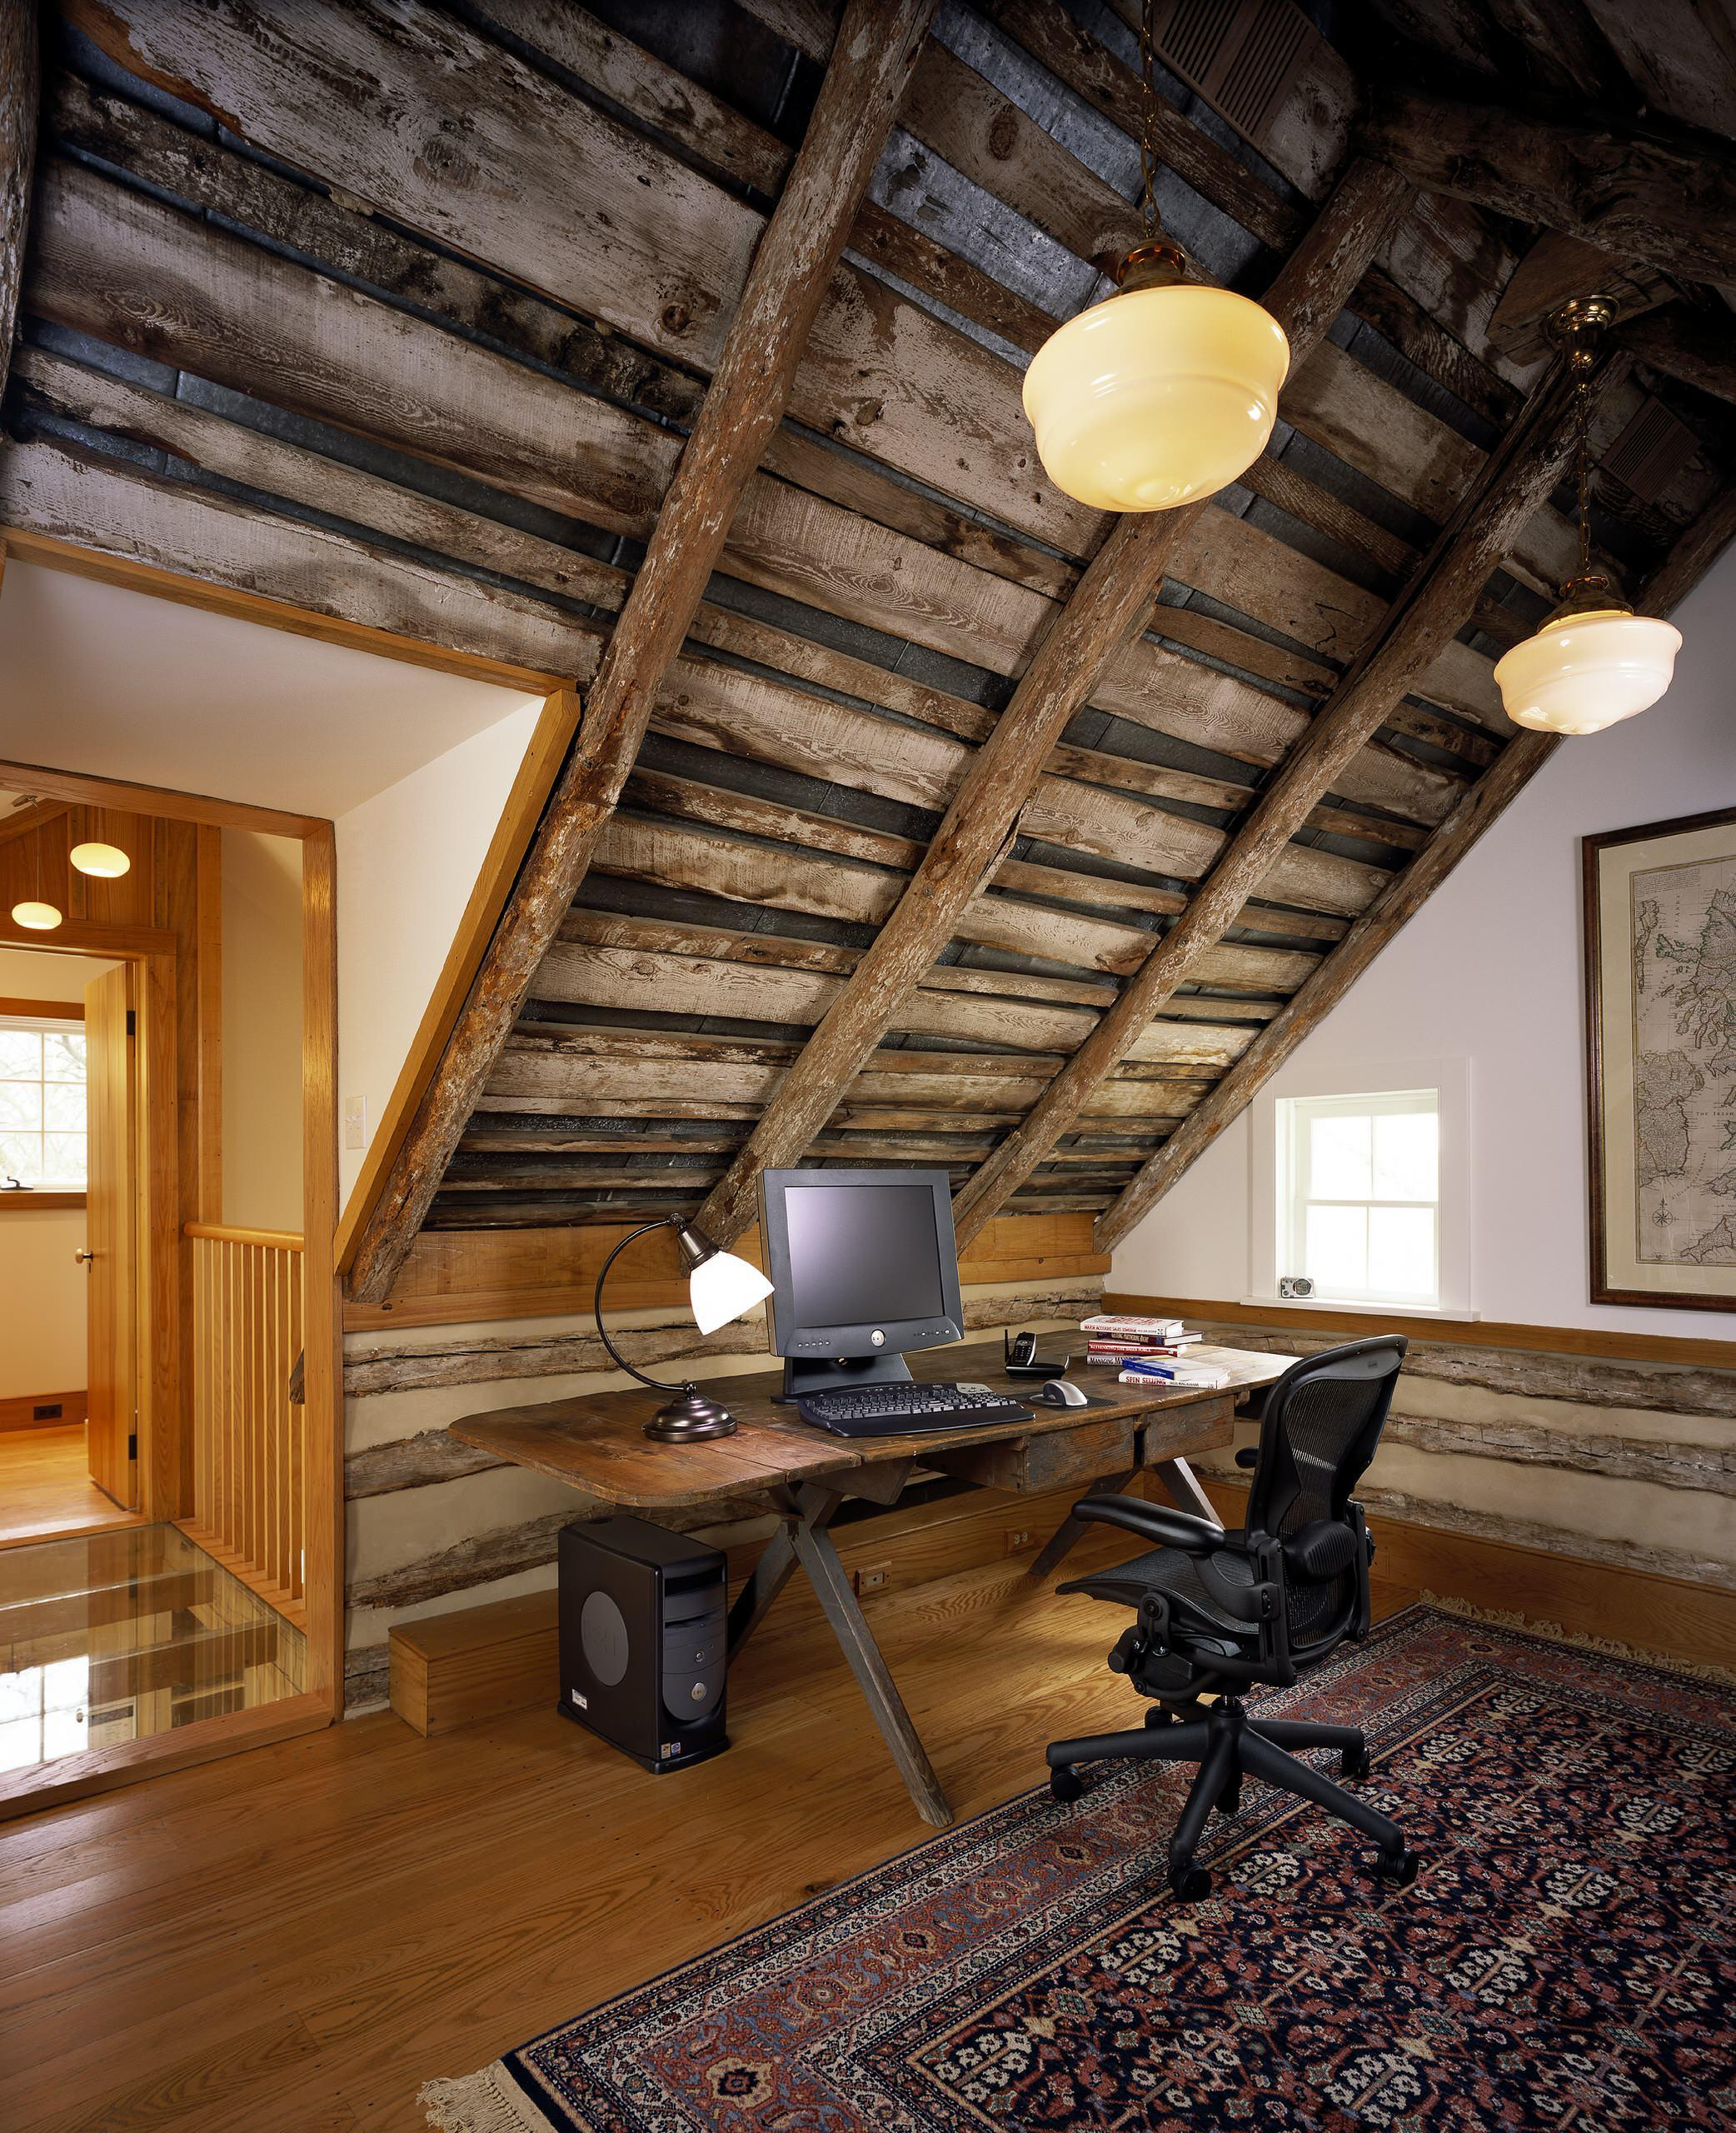 "Foto: Reprodução / <a href=""http://readerswartz.com"" target=""_blank"">Reader & Swartz Architects, P.C</a>"